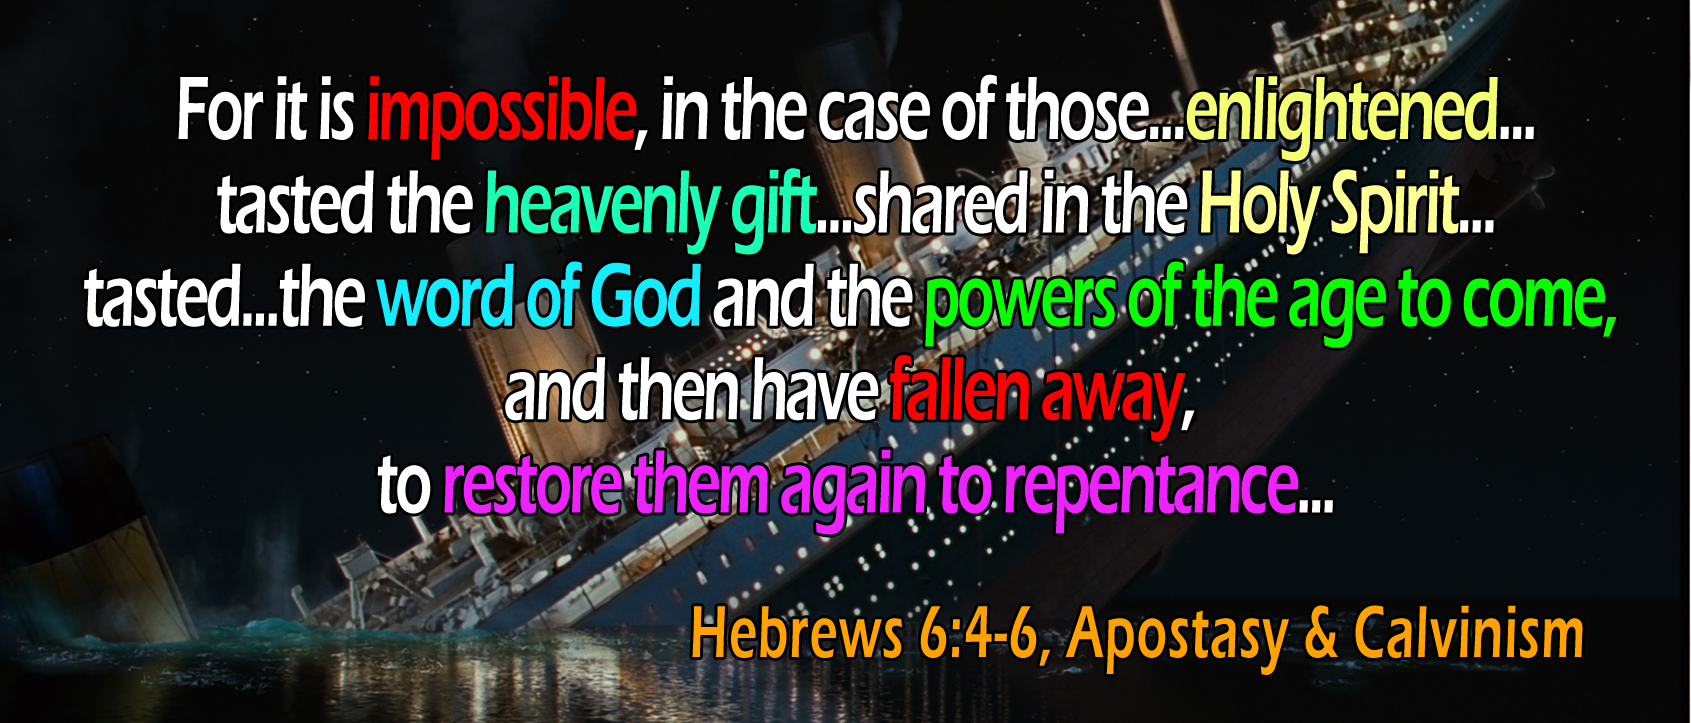 Hebrews 6:4-6, Apostasy and Calvinism - The Staunch Calvinist